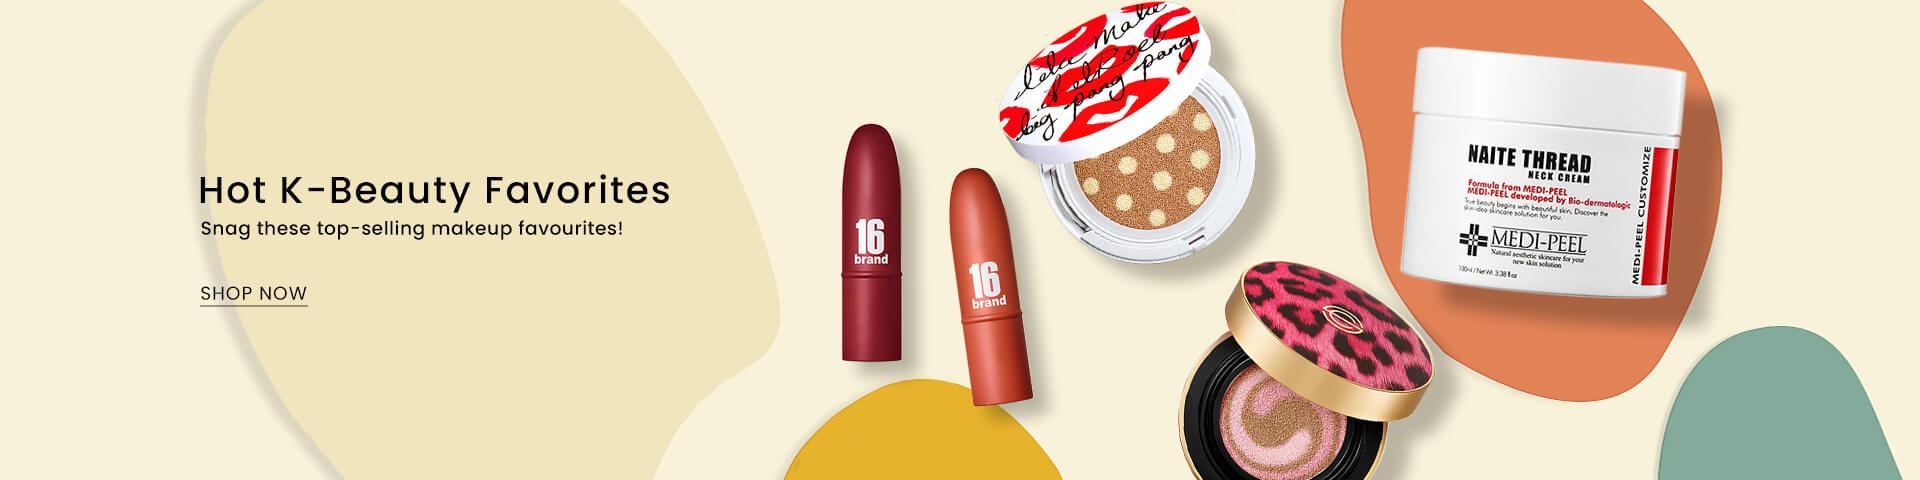 Sept 2019: K-Beauty Favorites (HG)